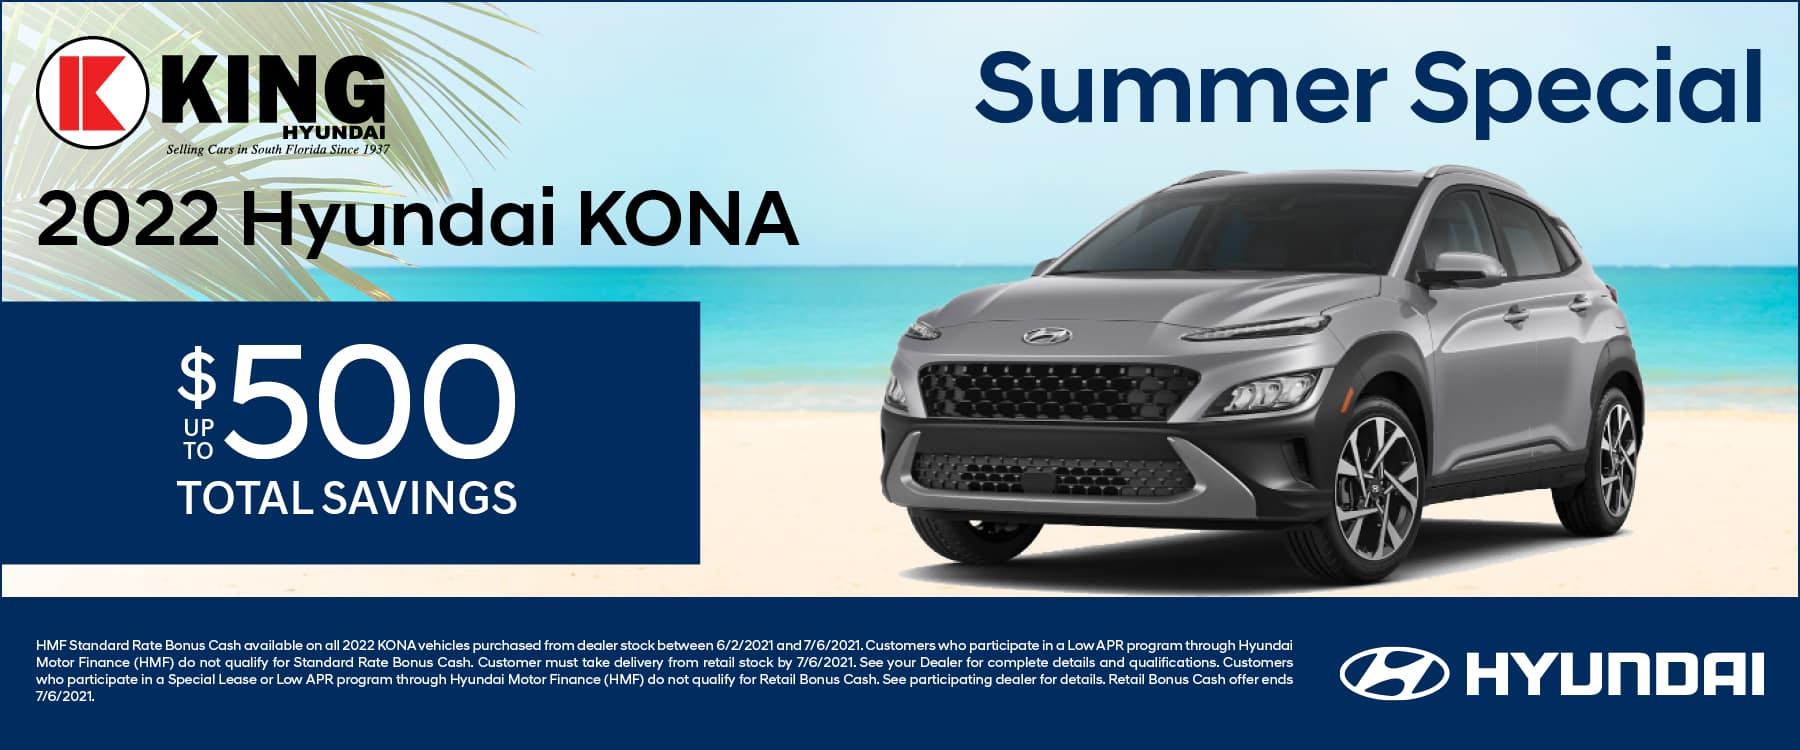 KNH-213253 King Hyundai June Banners 1800×750 Kona TotSav